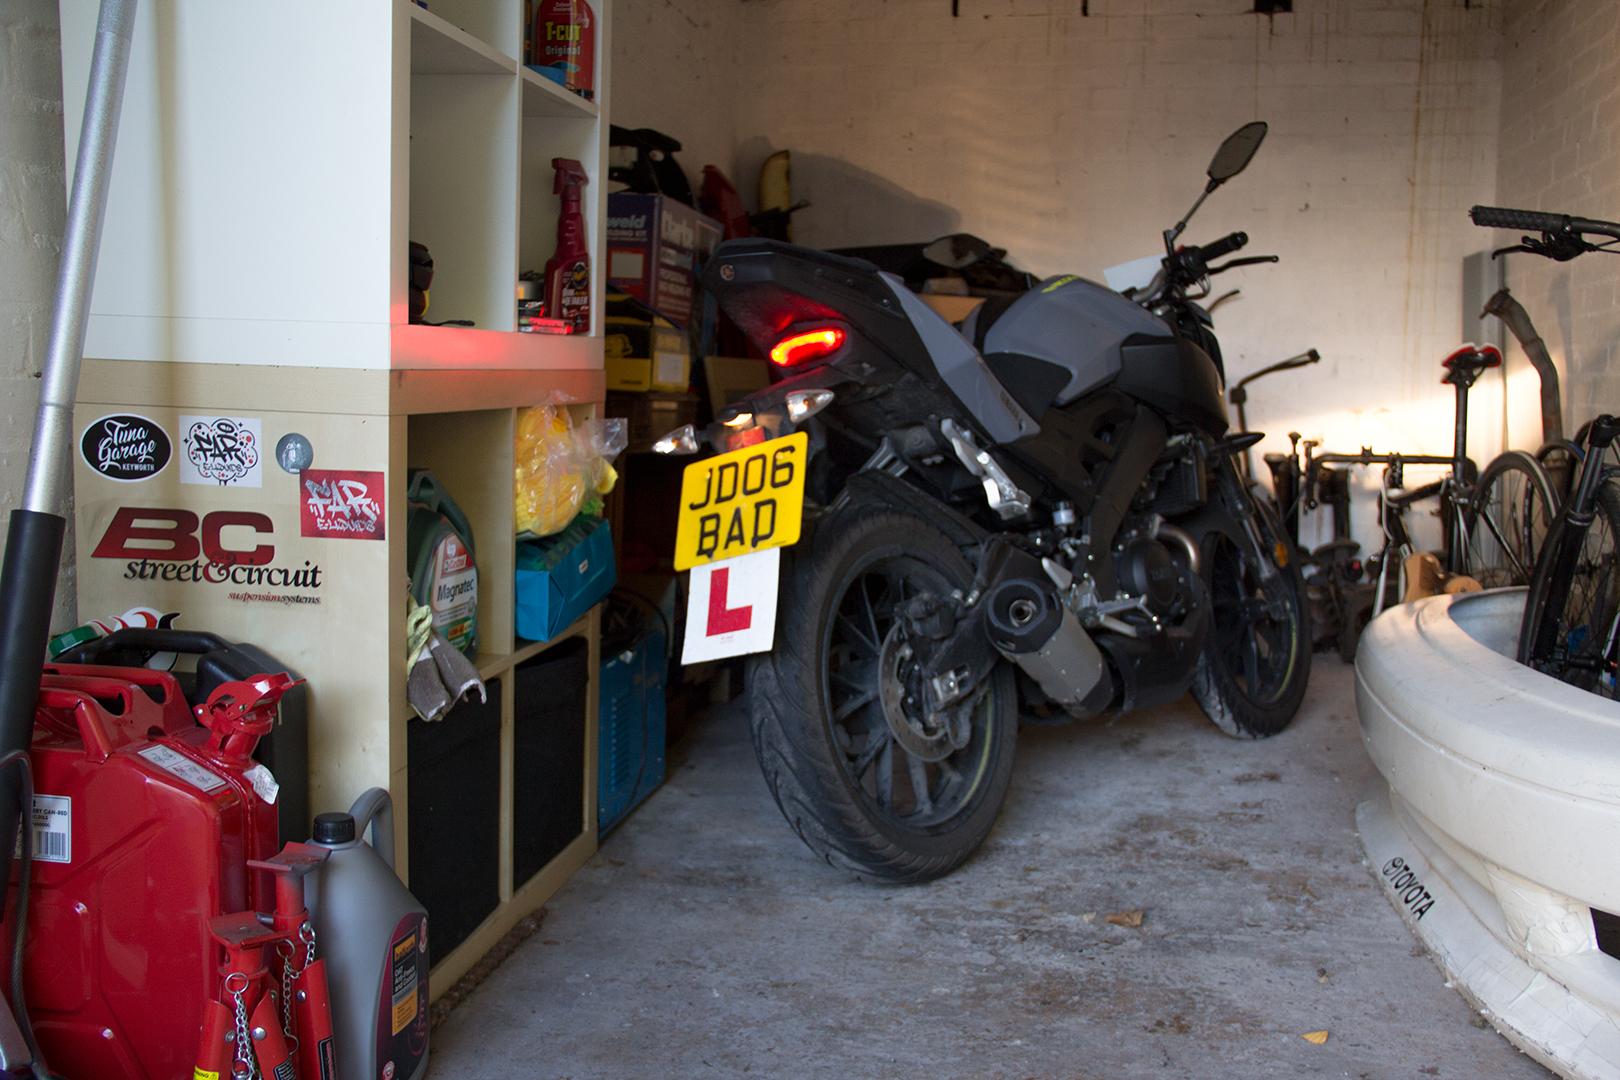 Bike in garage